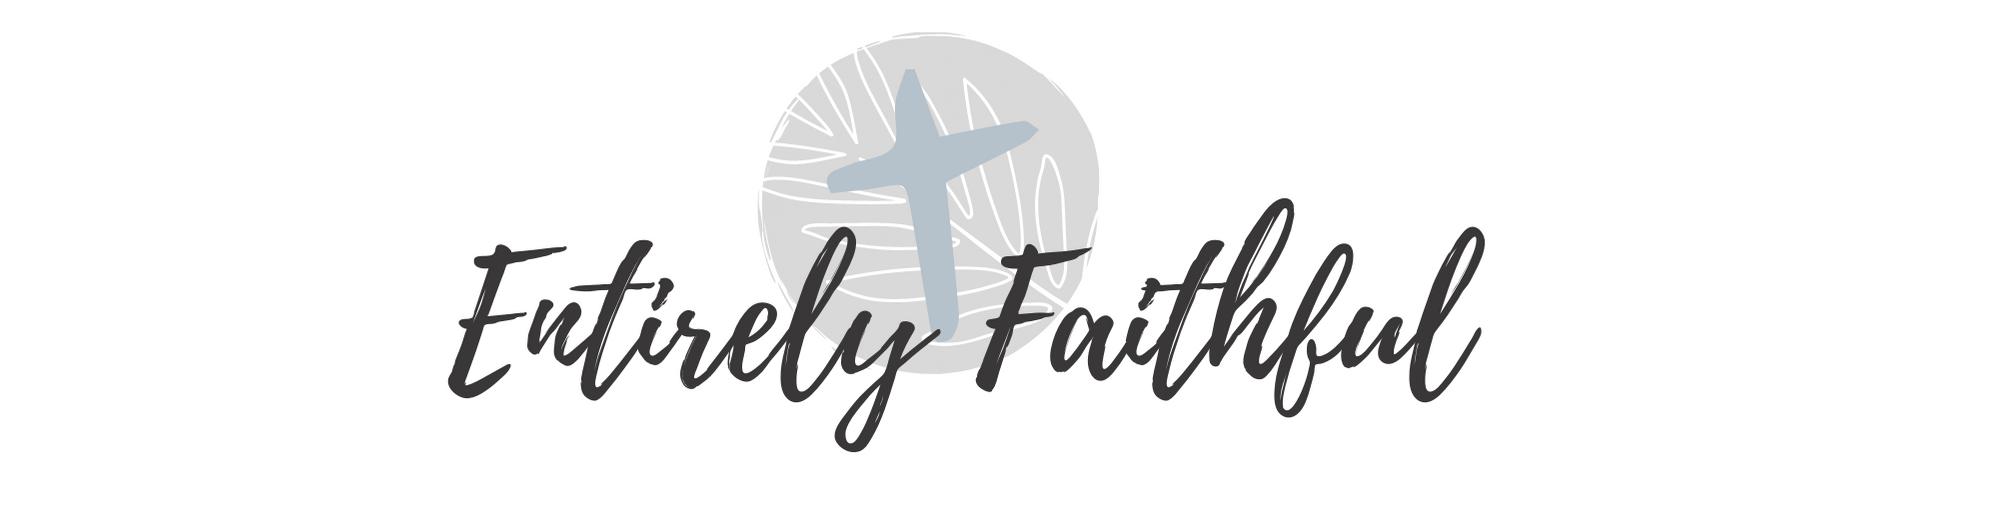 Entirely Faithful